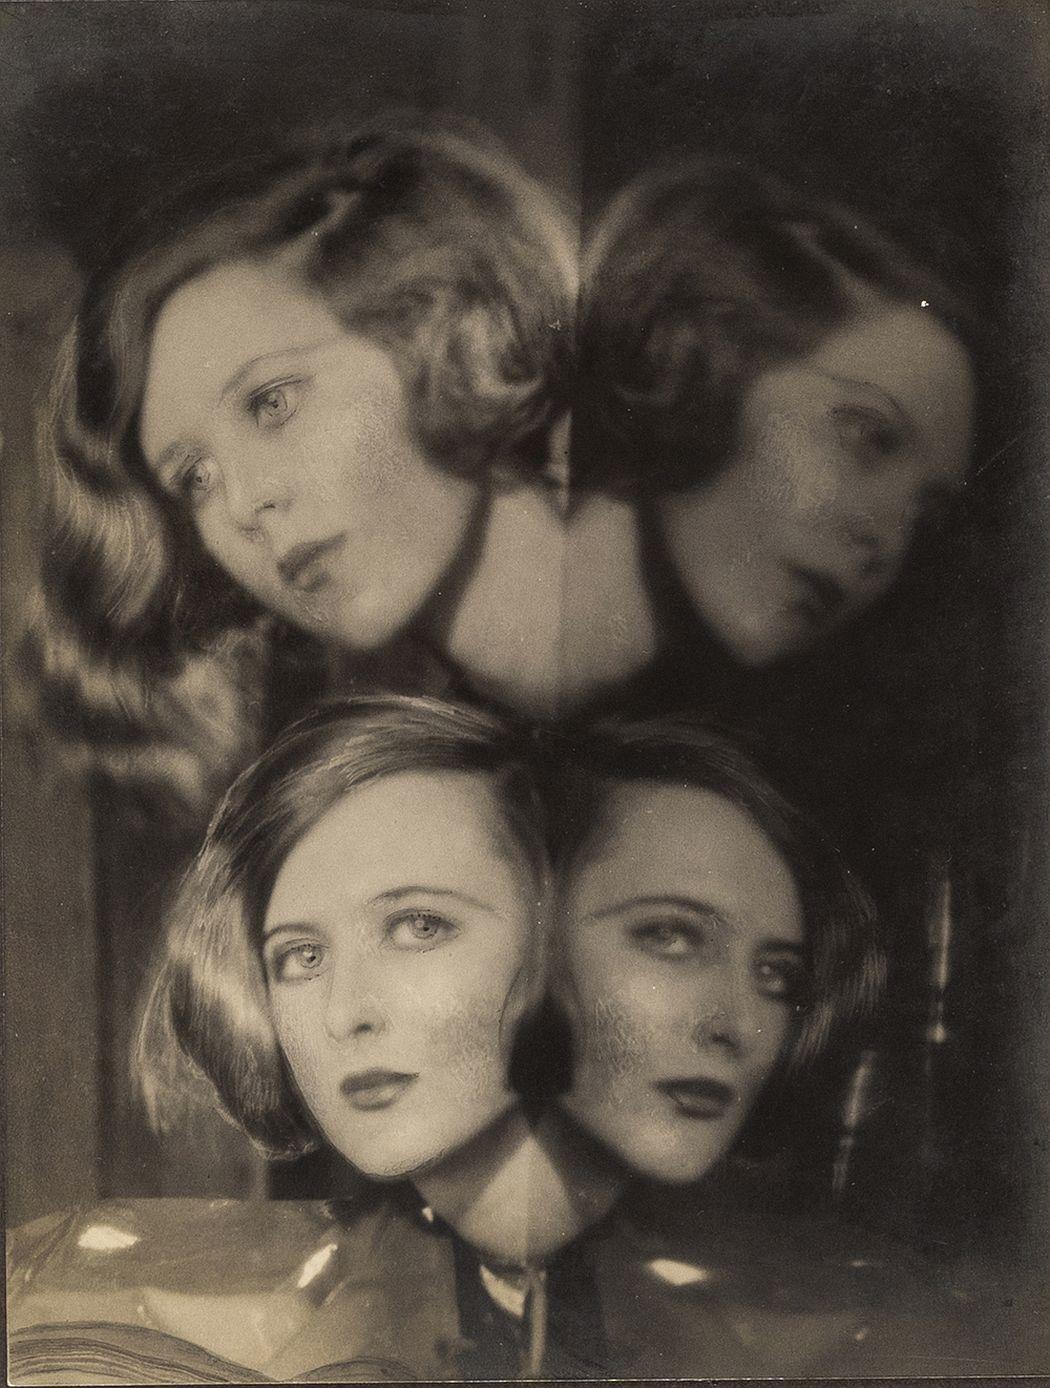 Nancy and Baba Beaton, 1924  Cecil Beaton